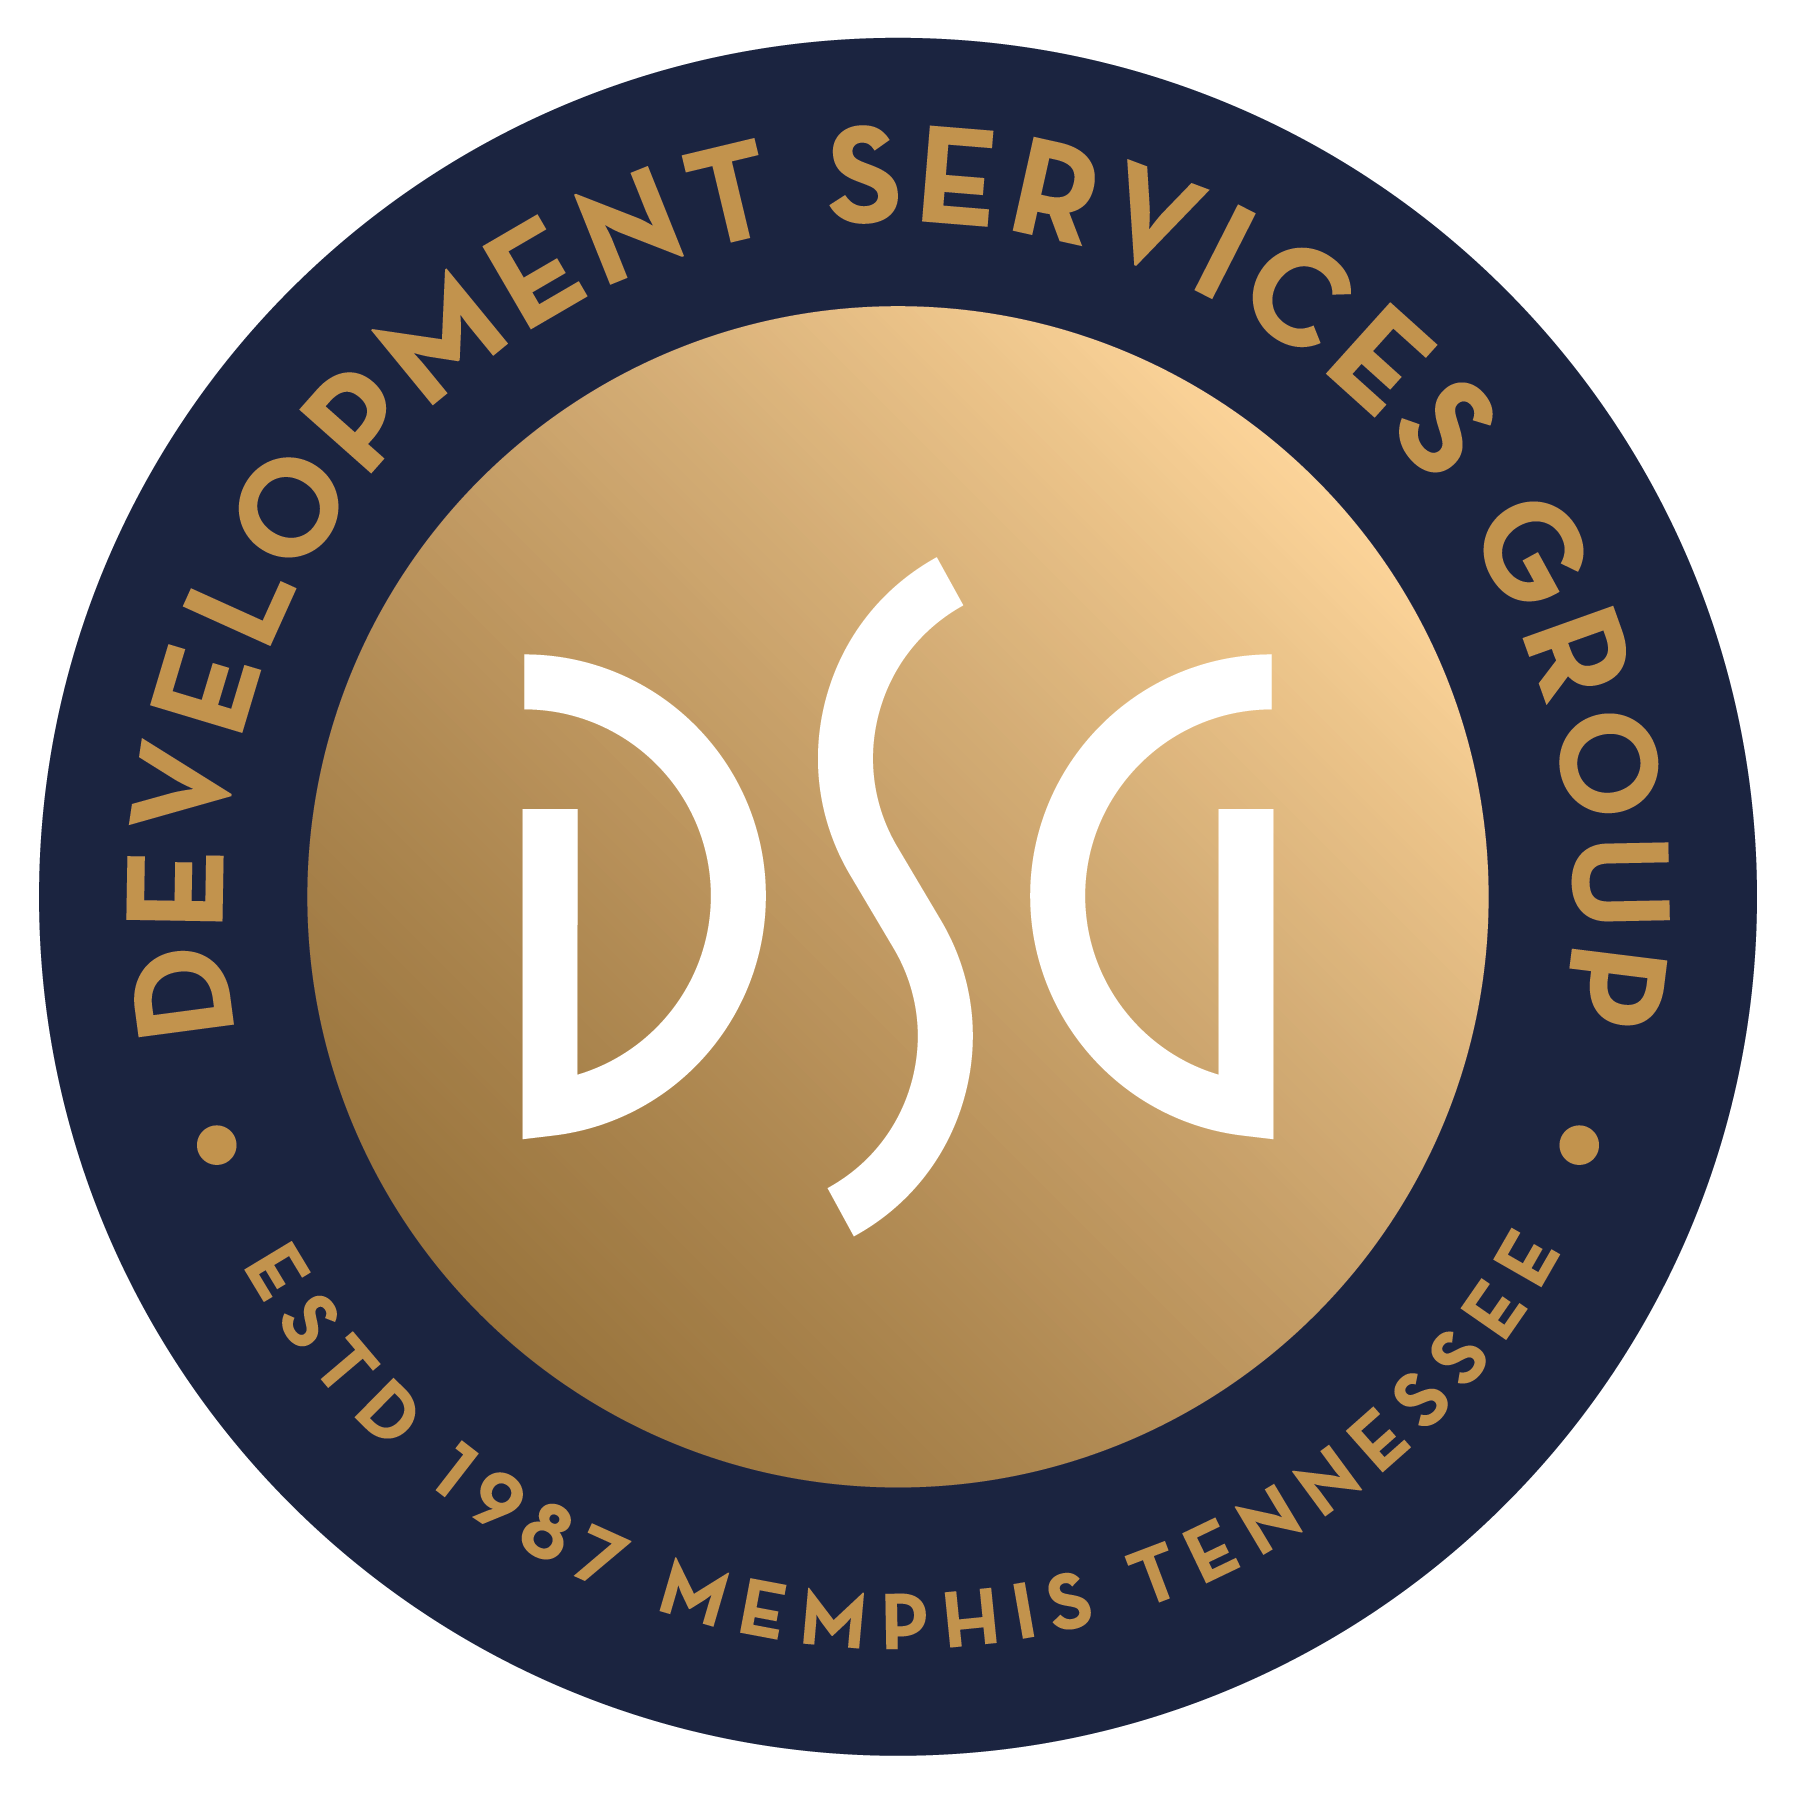 Develop Services Group